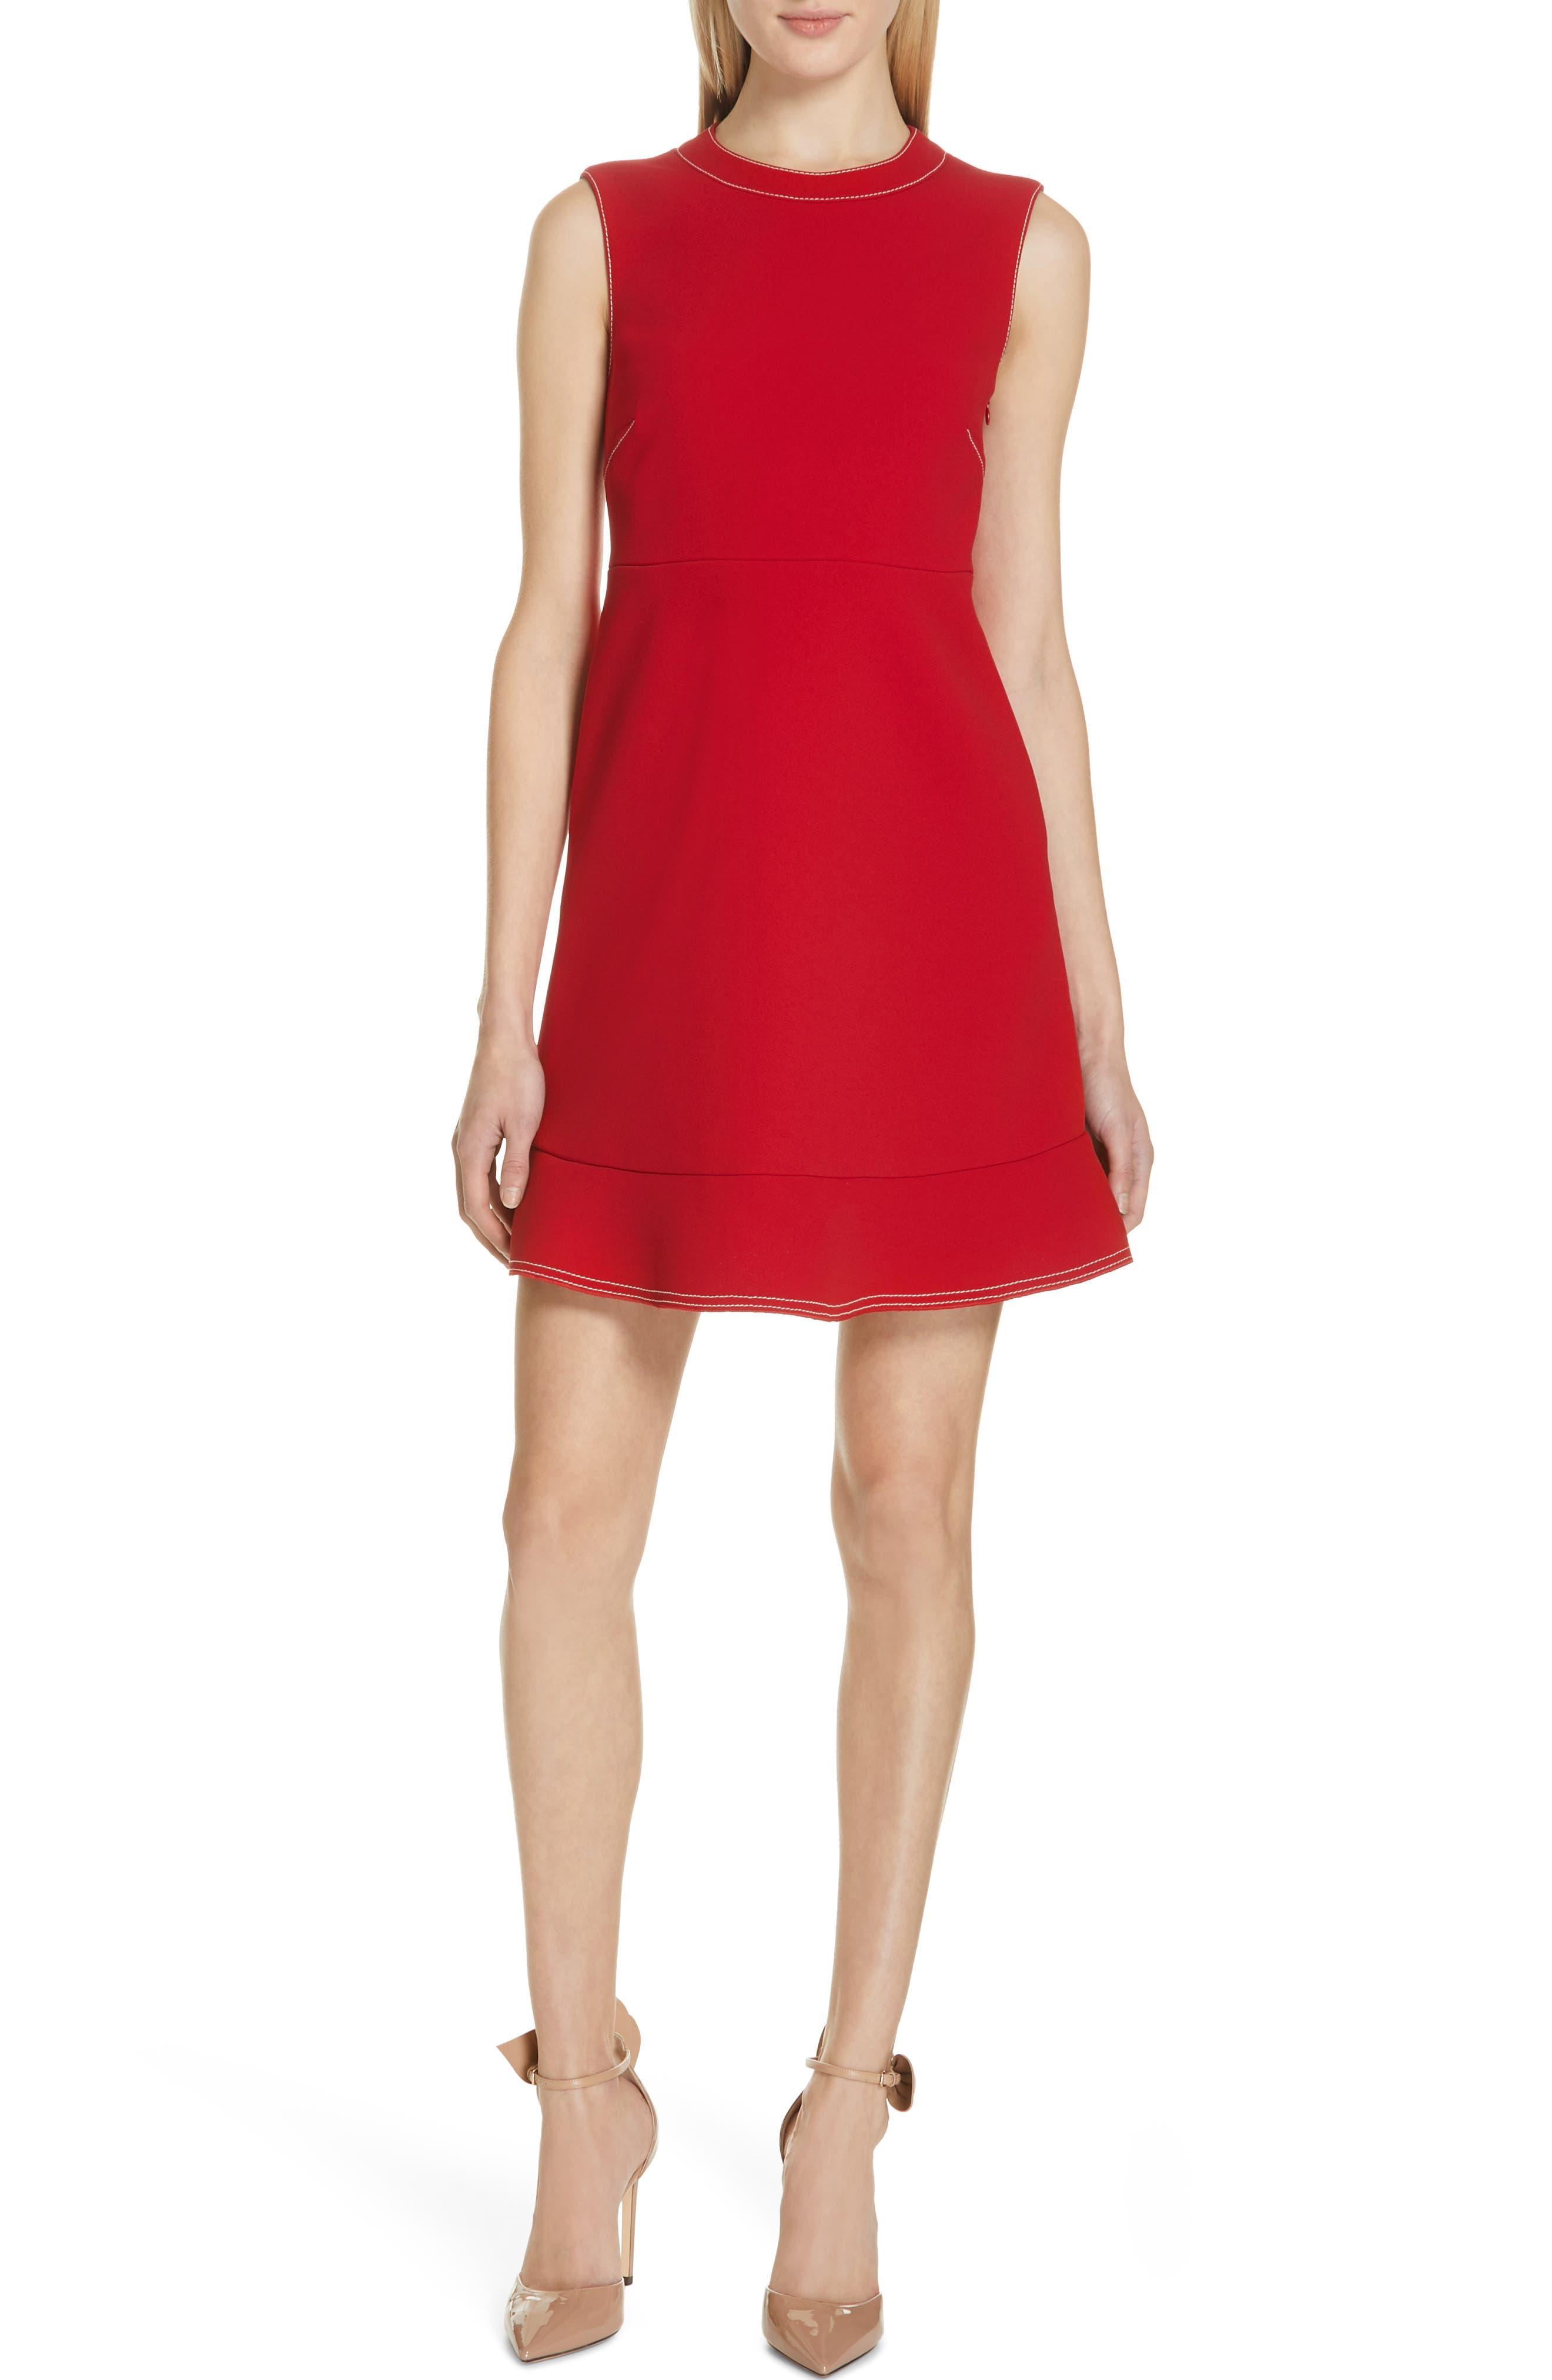 Red Valentino Contrast Stitch Ruffle Hem Minidress, US / 44 IT - Red